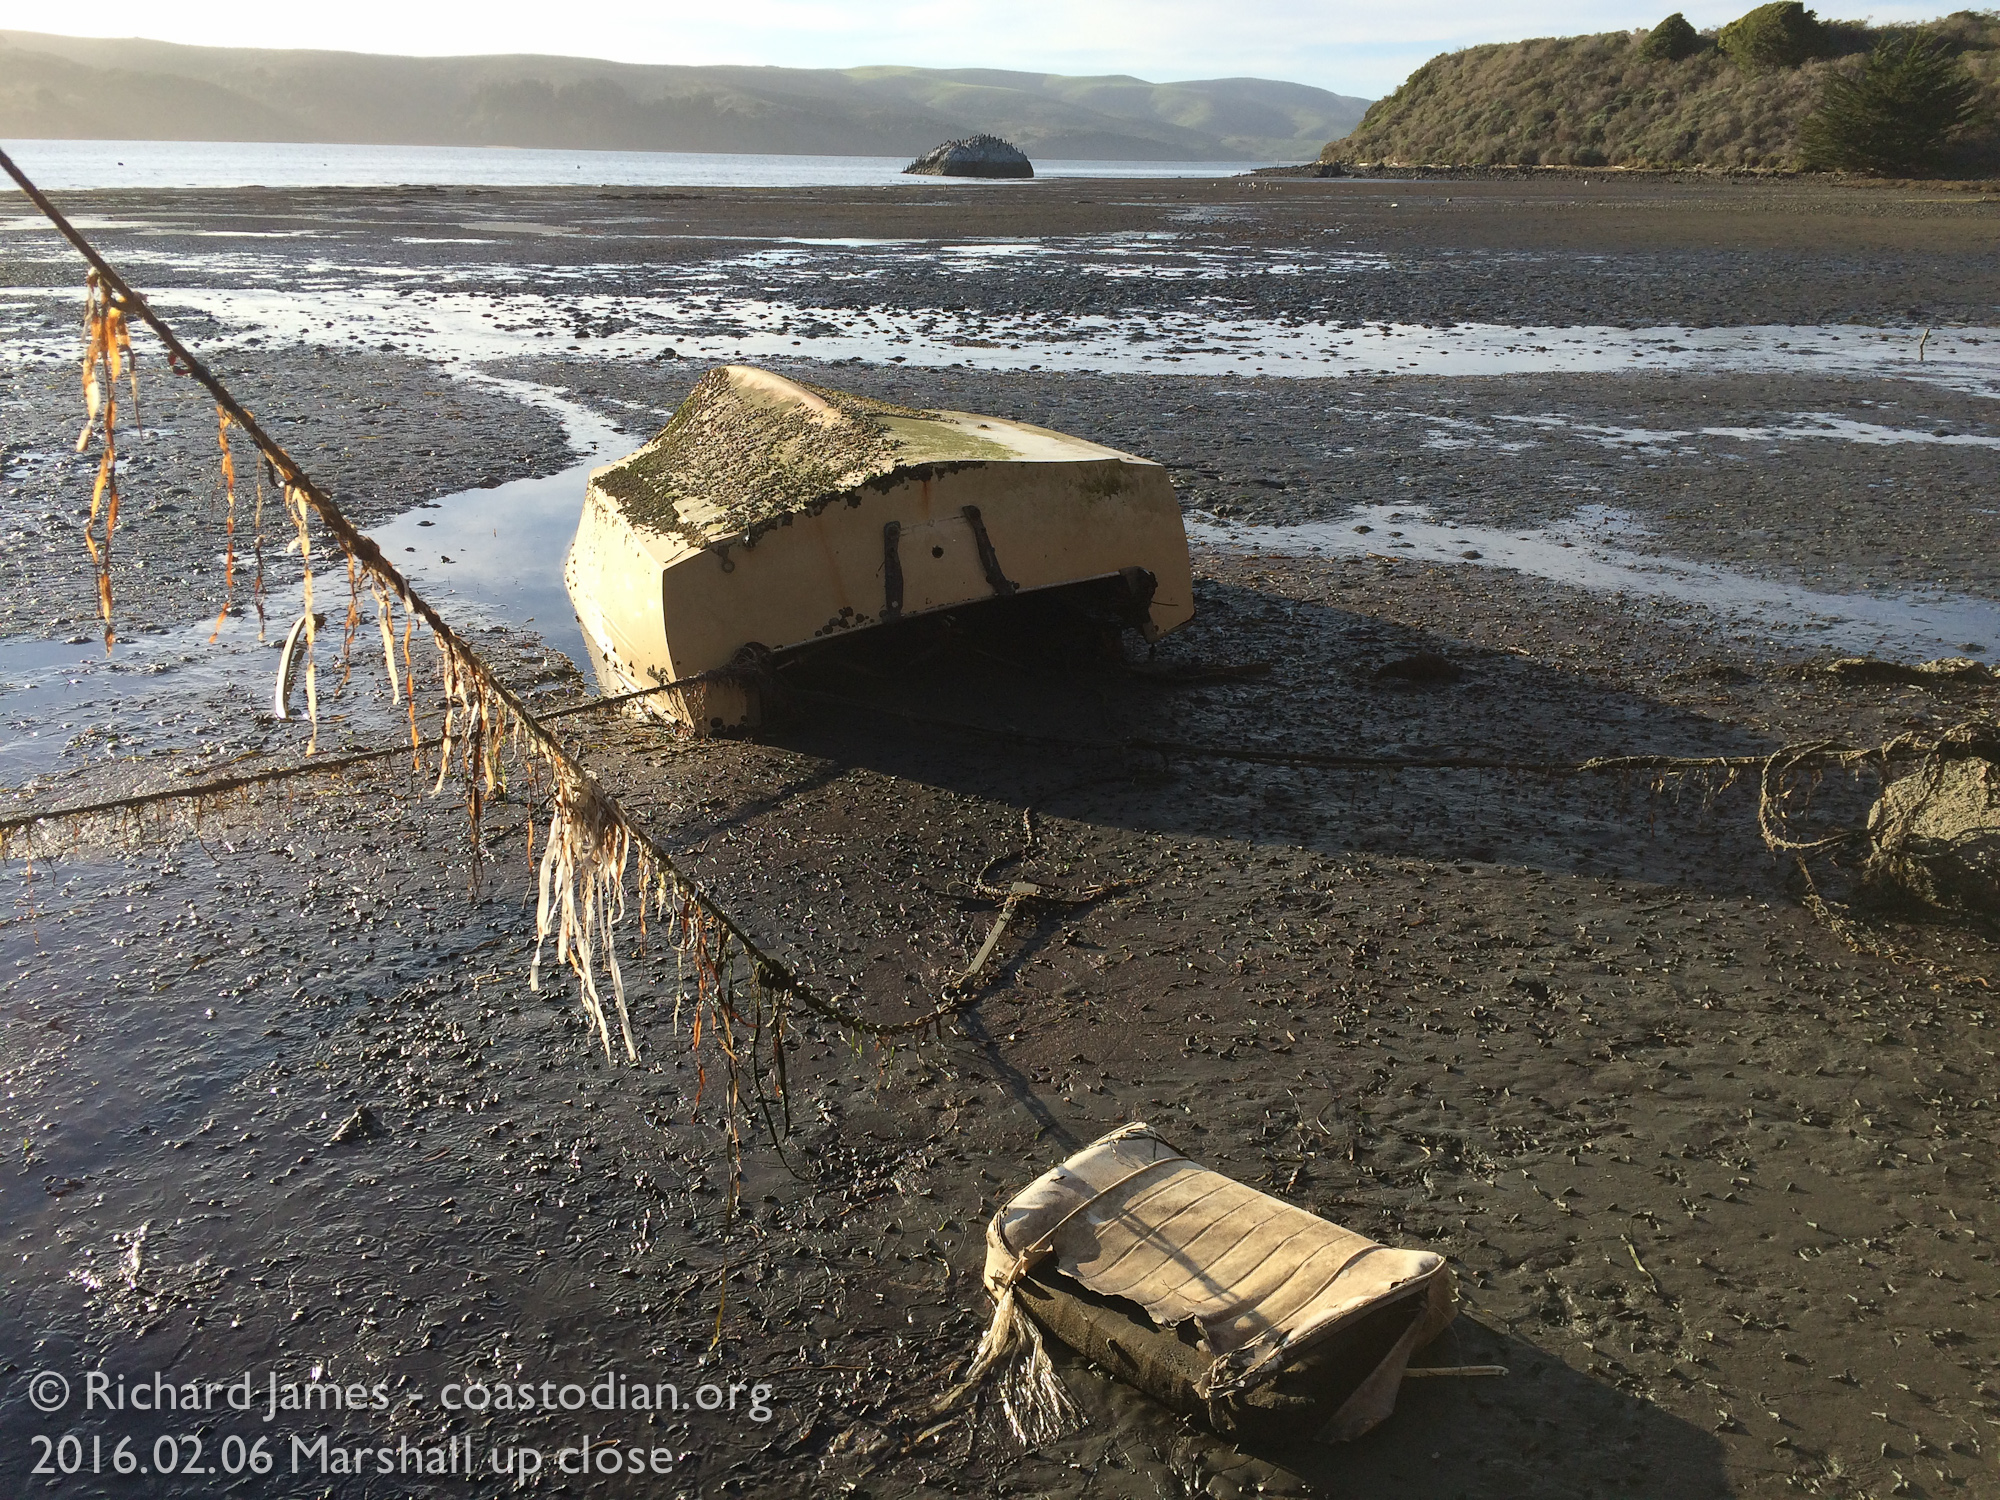 Capsized boat, seat cushion making an escape. ©Richard James - coastodian.org